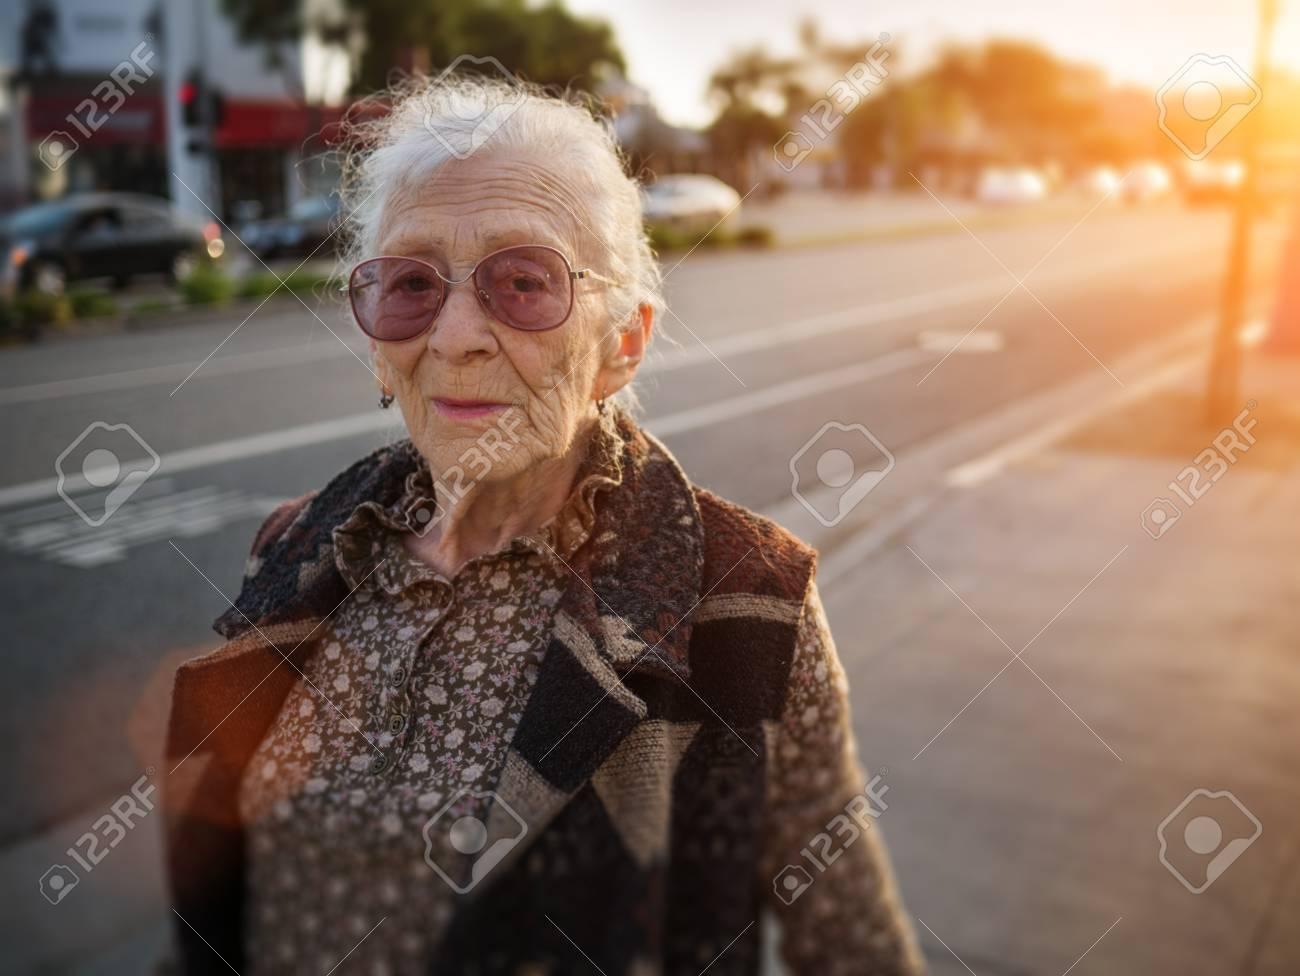 Portrait of senior woman on city street, closeup. Stock Photo - 24276221